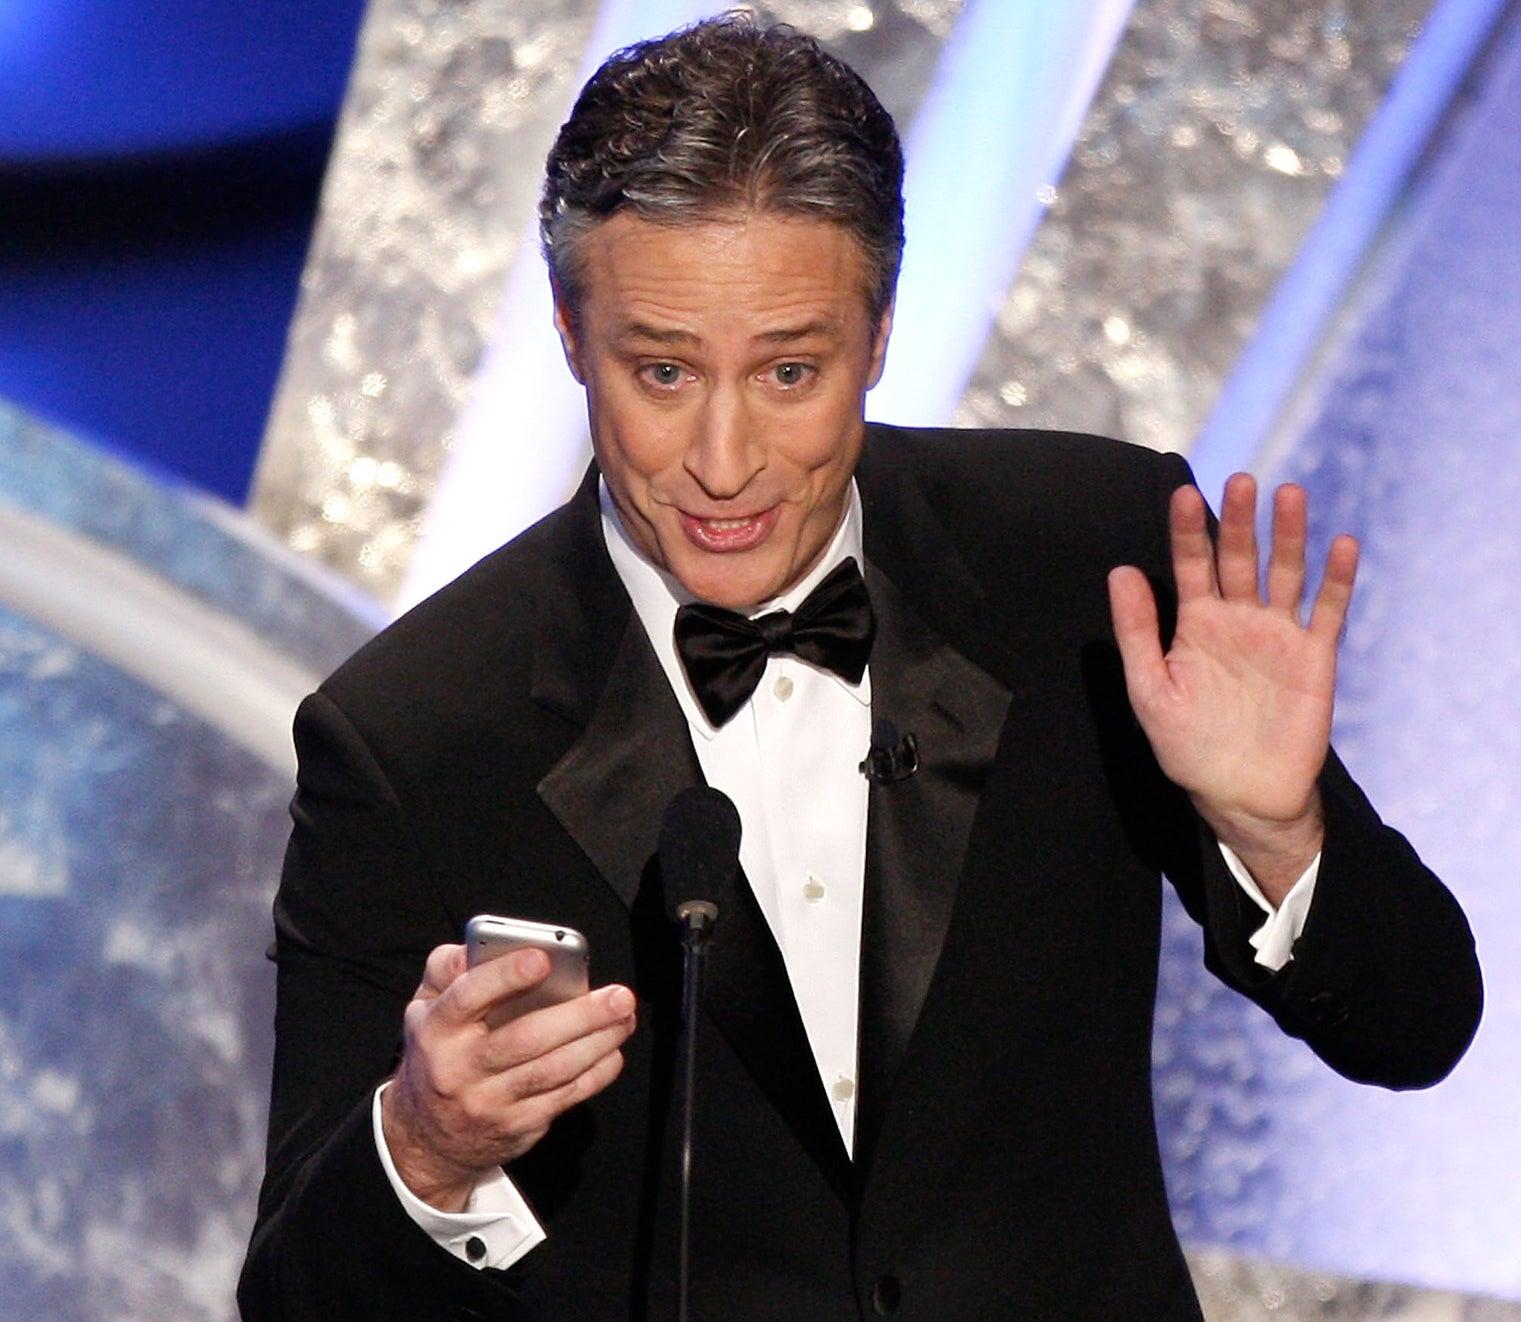 Jon Stewart hosted the 80th Annual Academy Awards.